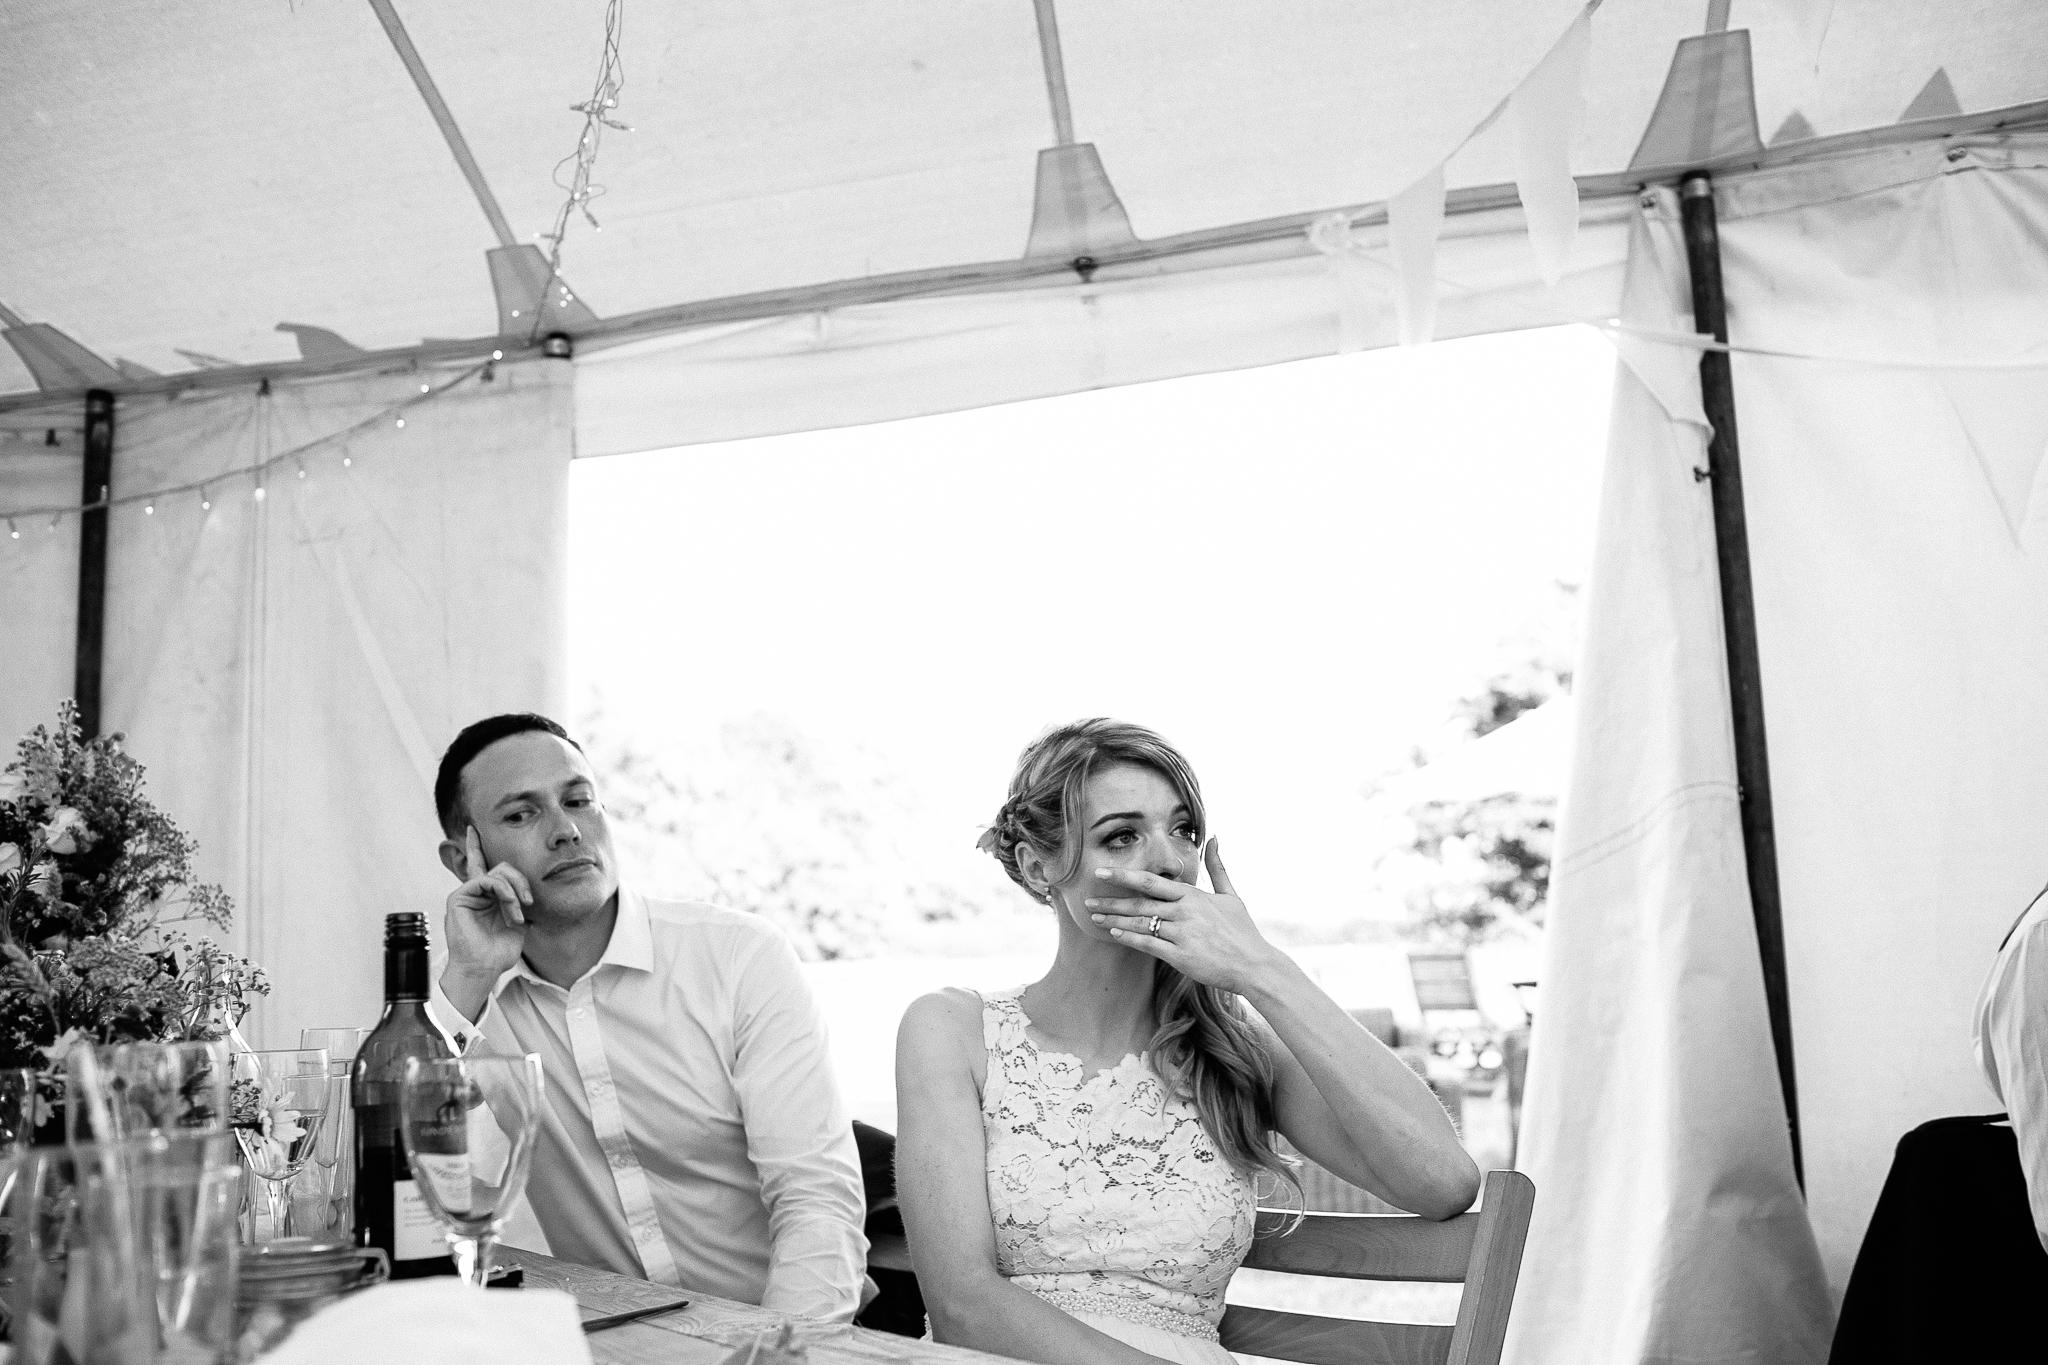 grantham_wedding_photographer-99.jpg